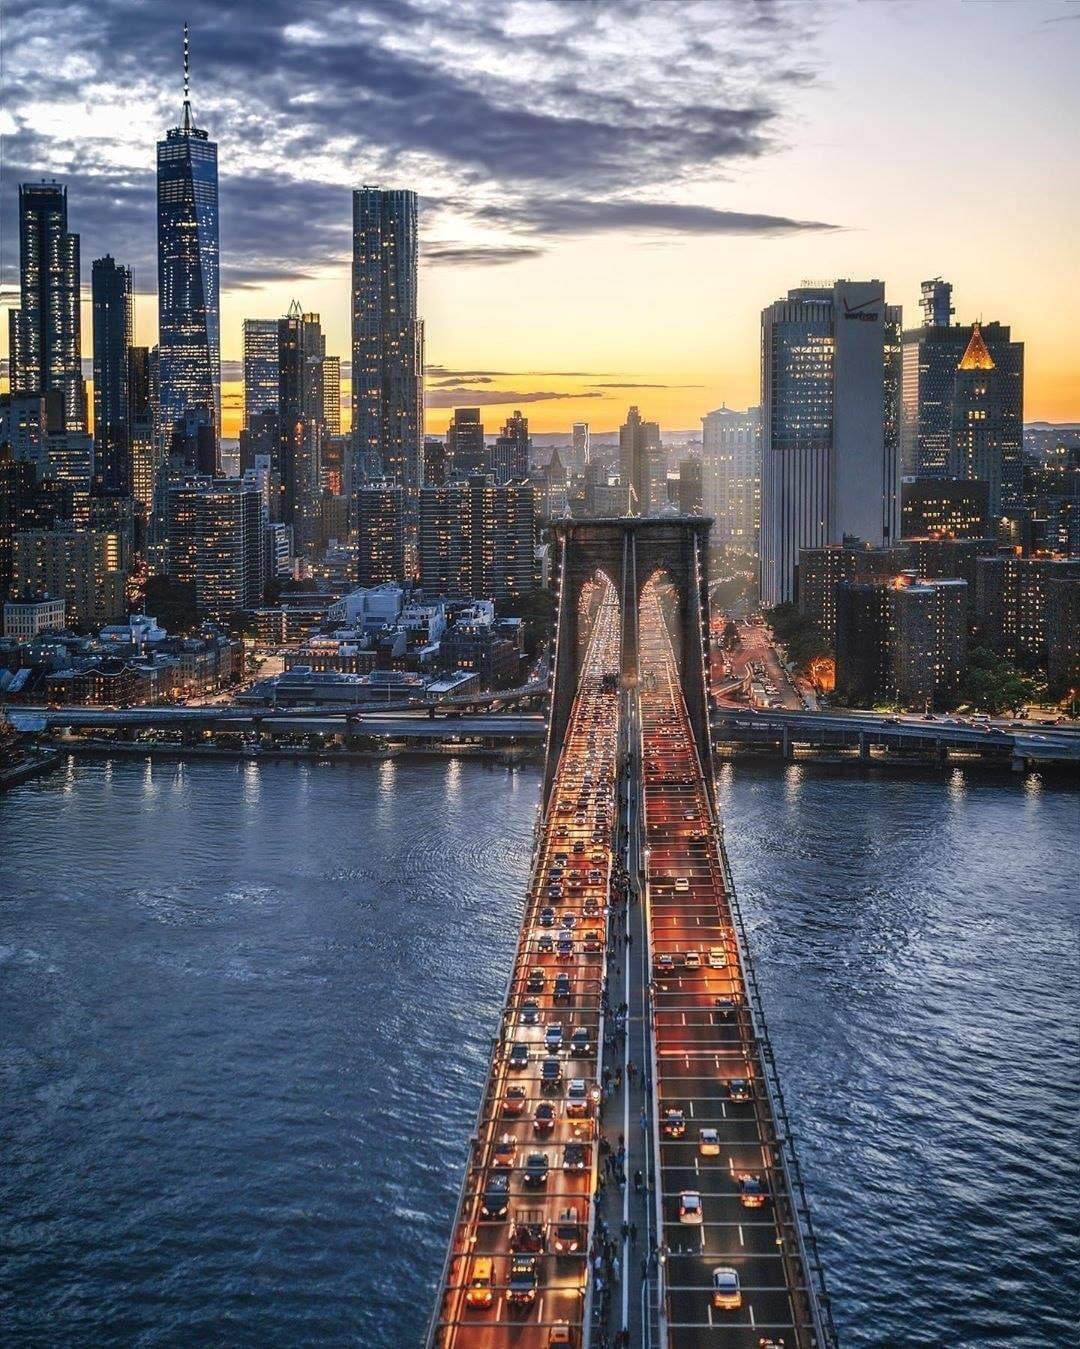 Brooklyn Bridge leading into Lower Manhattan,NYC